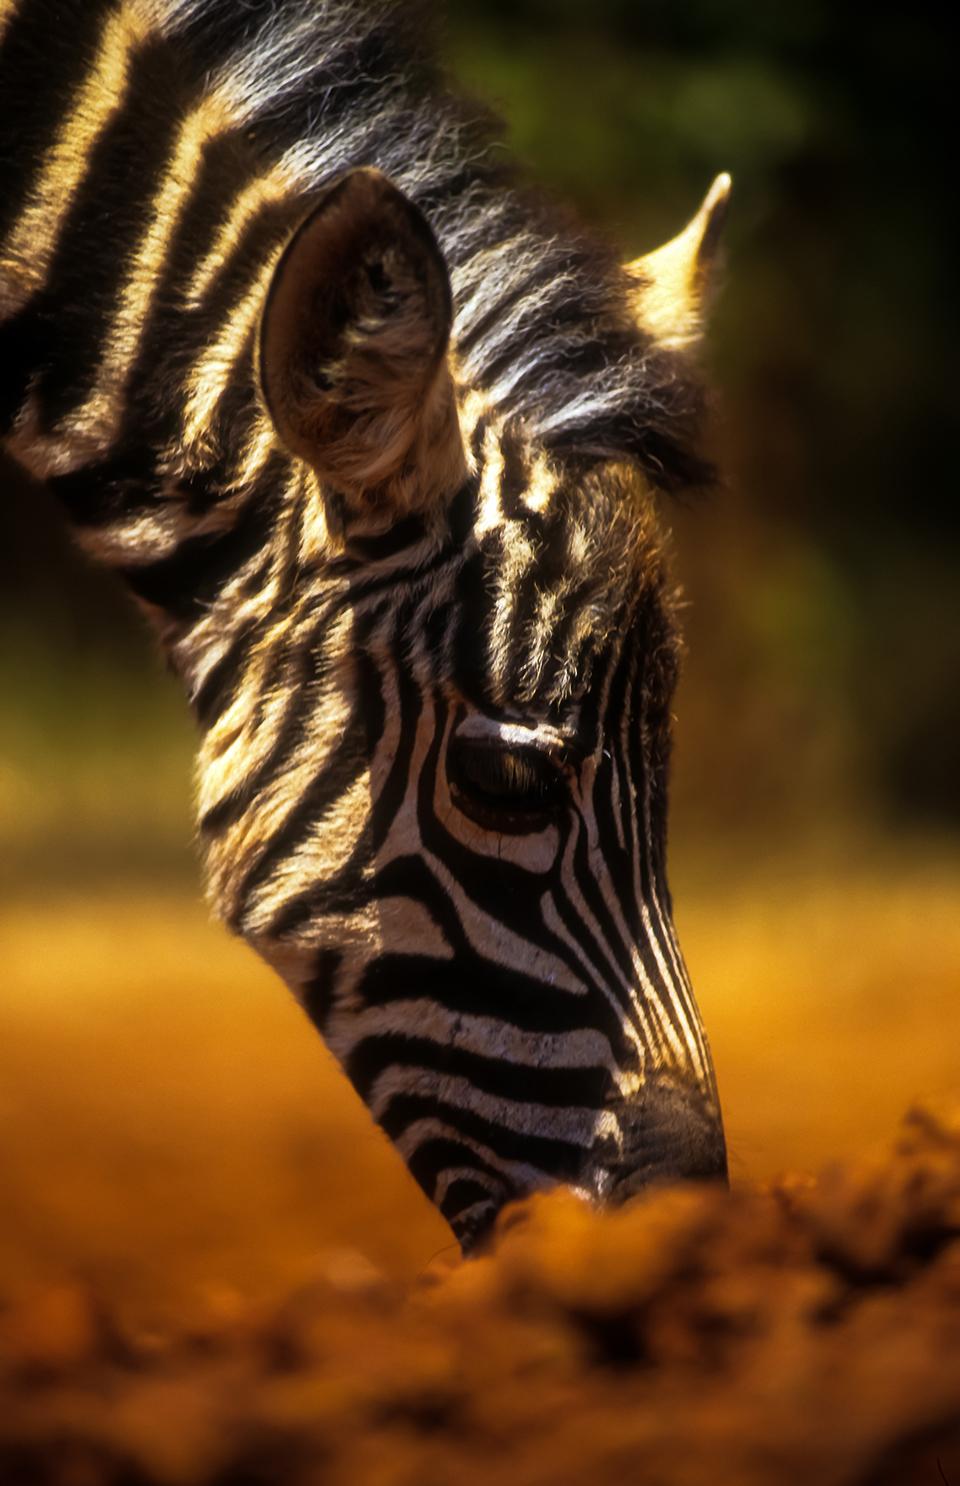 Baby Zebra at Daphne Sheldricks Orphanage, Nairobi, Kenya. Africa. 2000(Levels checked).jpg